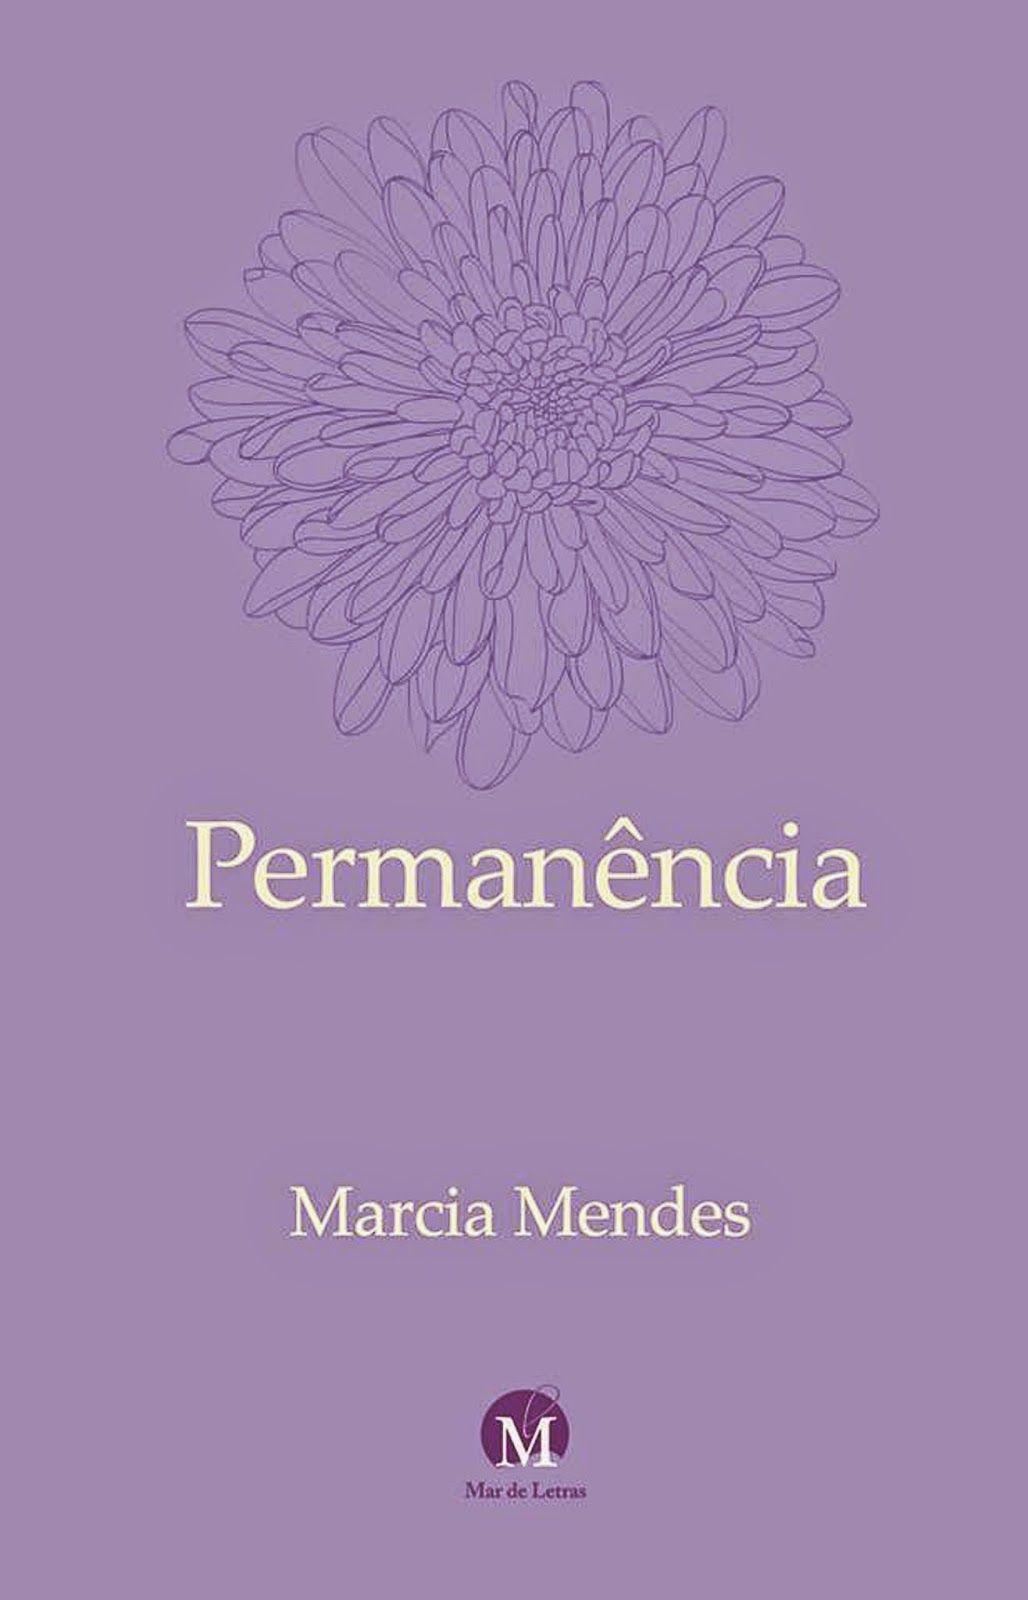 Ode à Mulher de Marcia Mendes